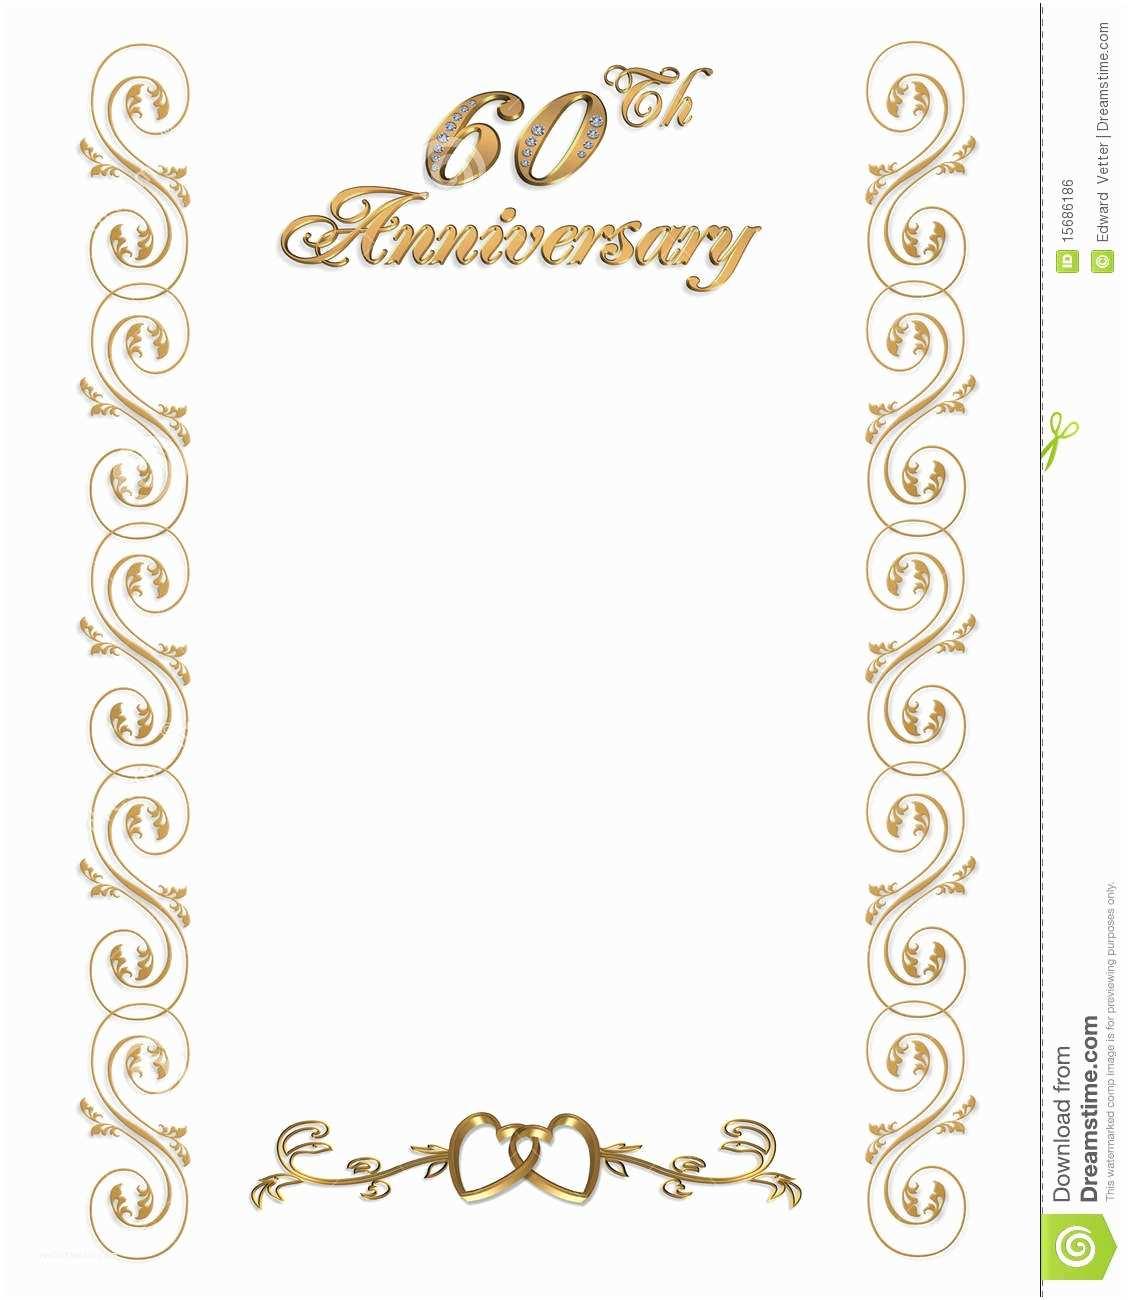 60th Wedding Anniversary Invitations Free Templates 60th Wedding Anniversary Invitations Template